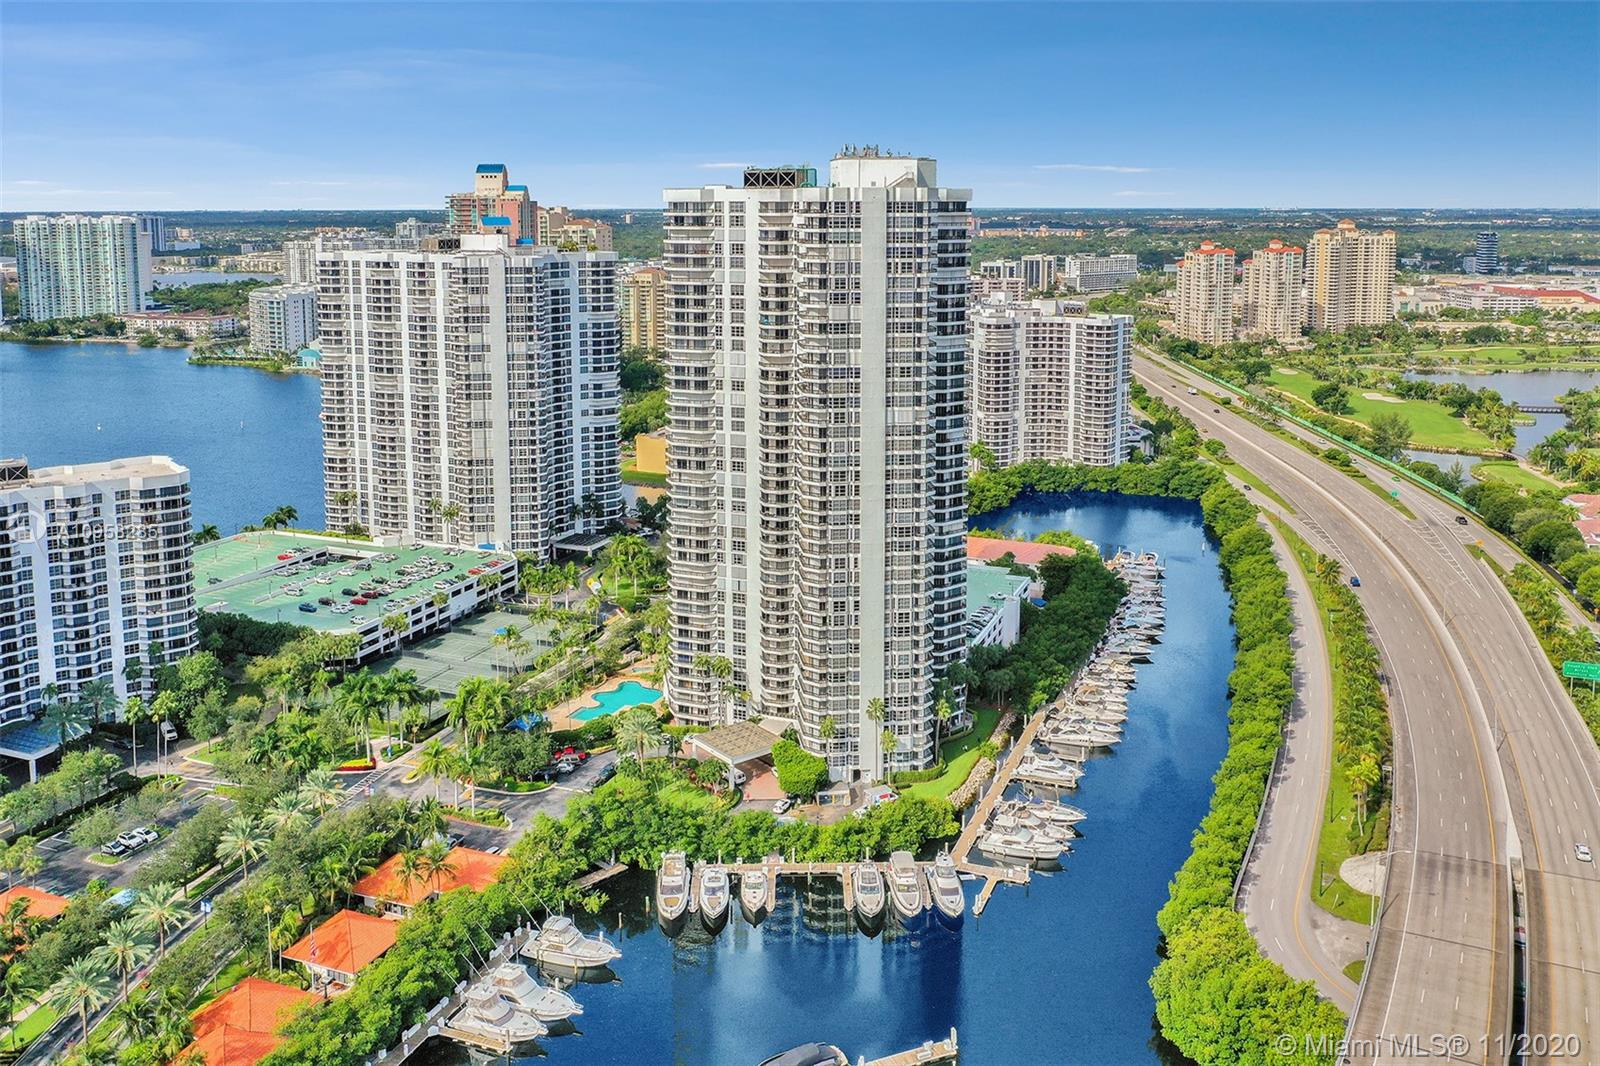 Mystic Pointe Tower 400 #2101 - 3500 Mystic Pointe Dr #2101, Aventura, FL 33180